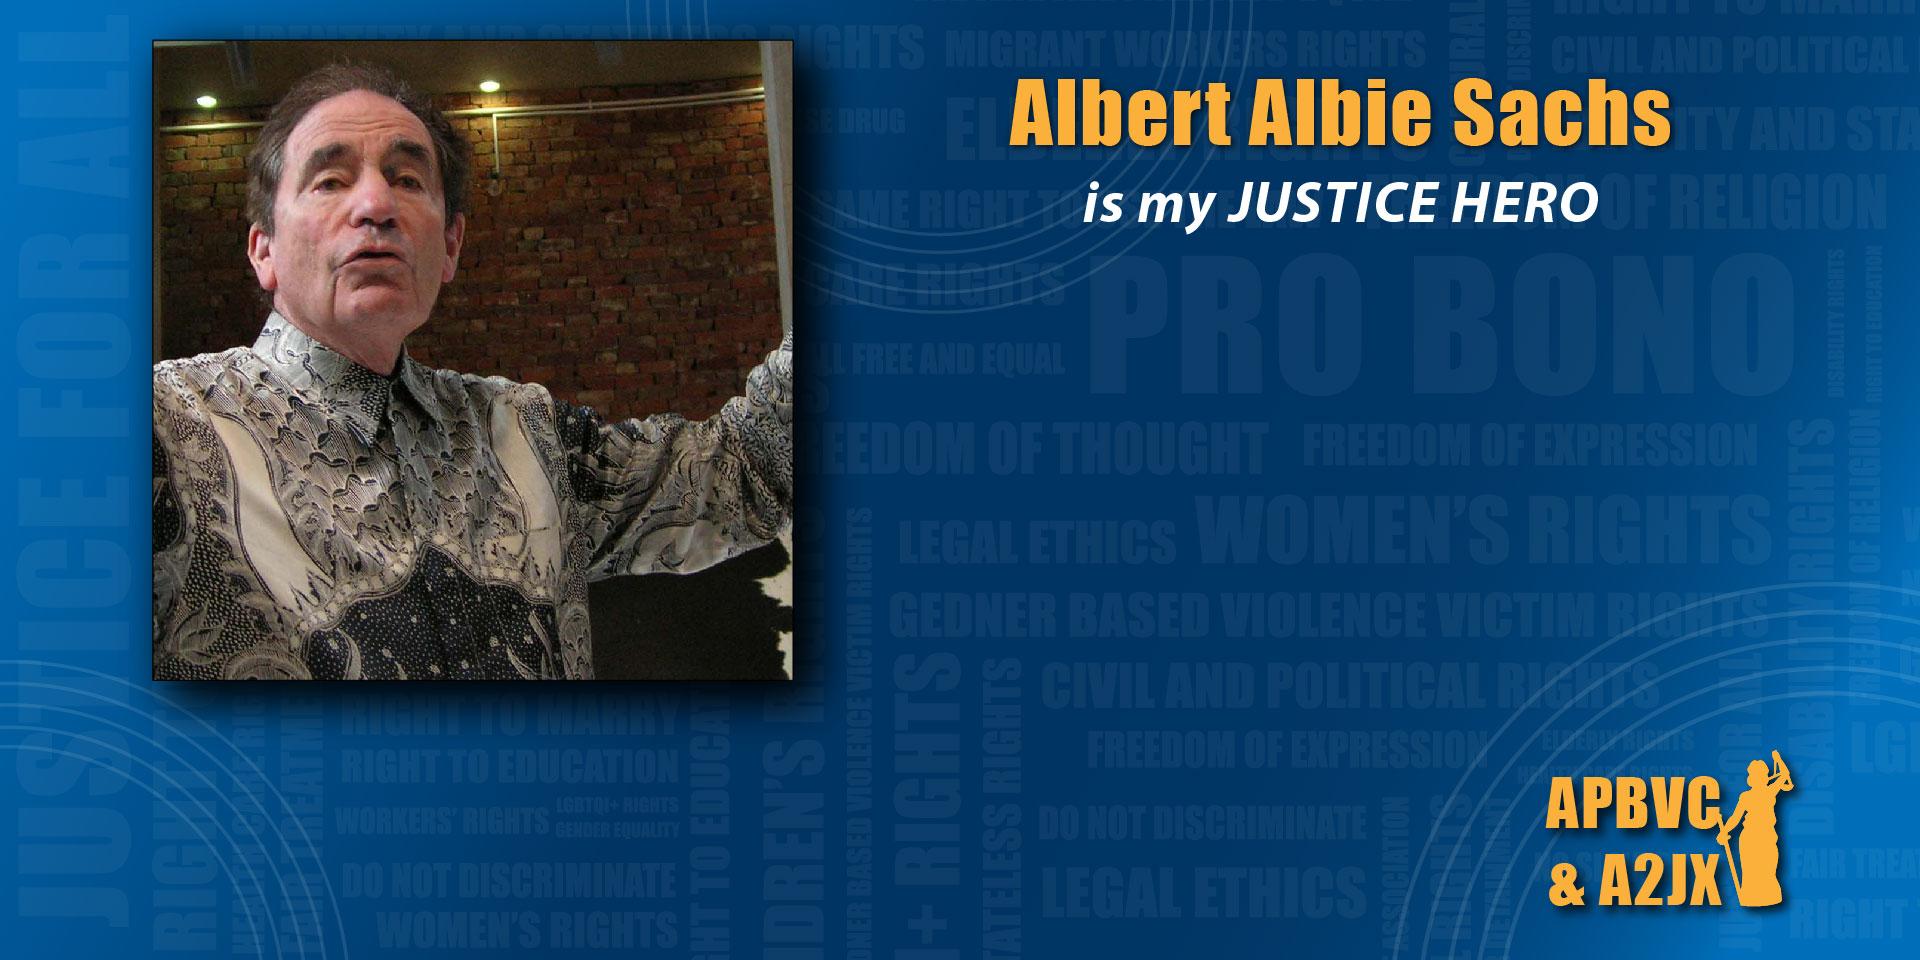 Albert Albie Sachs